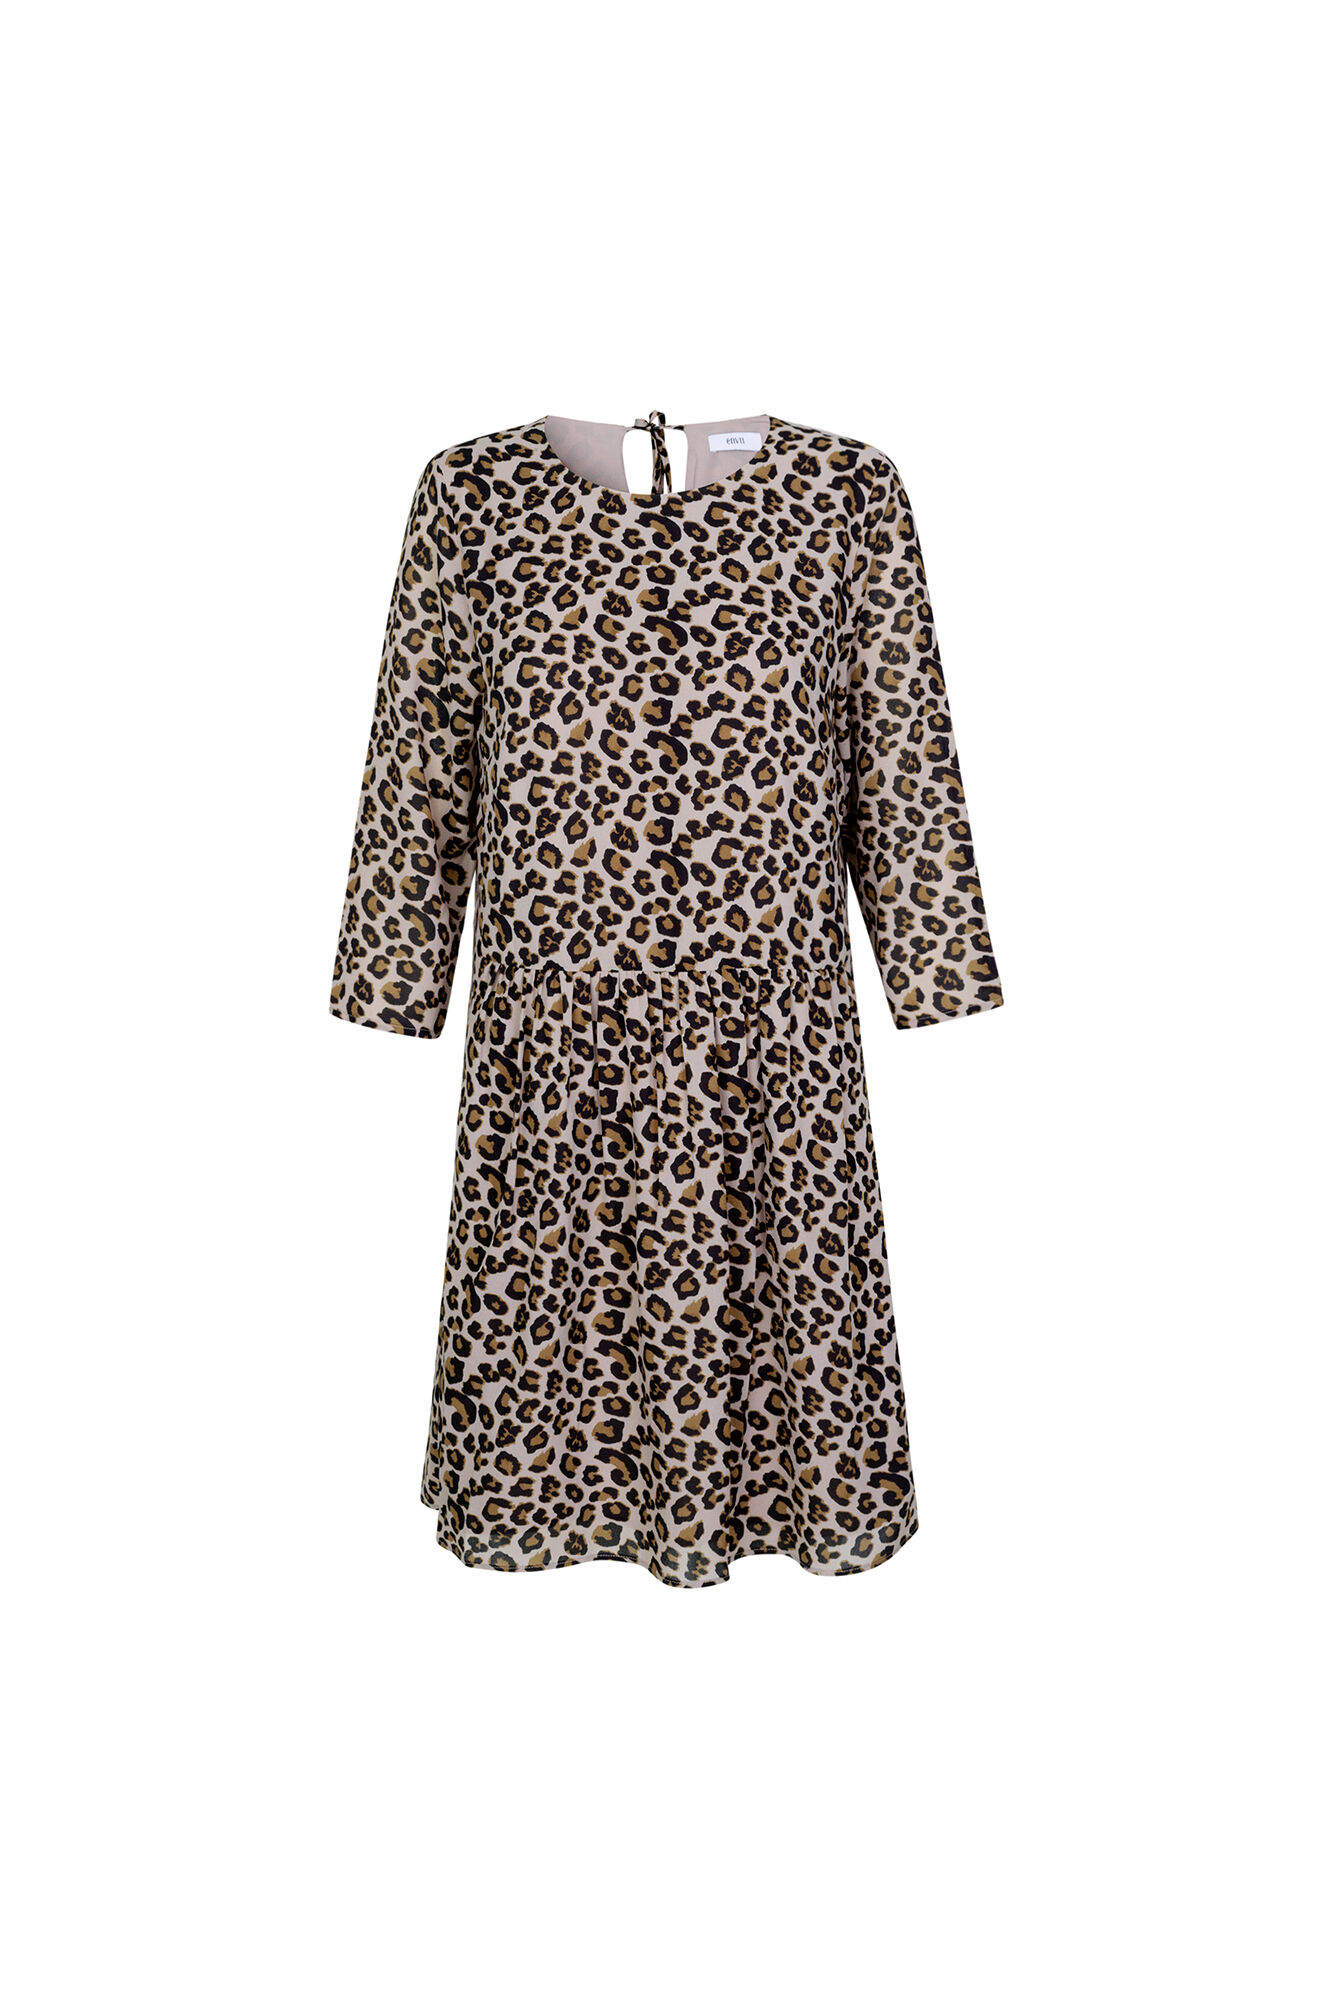 ENMOORE 3/4 DRESS AOP 6544